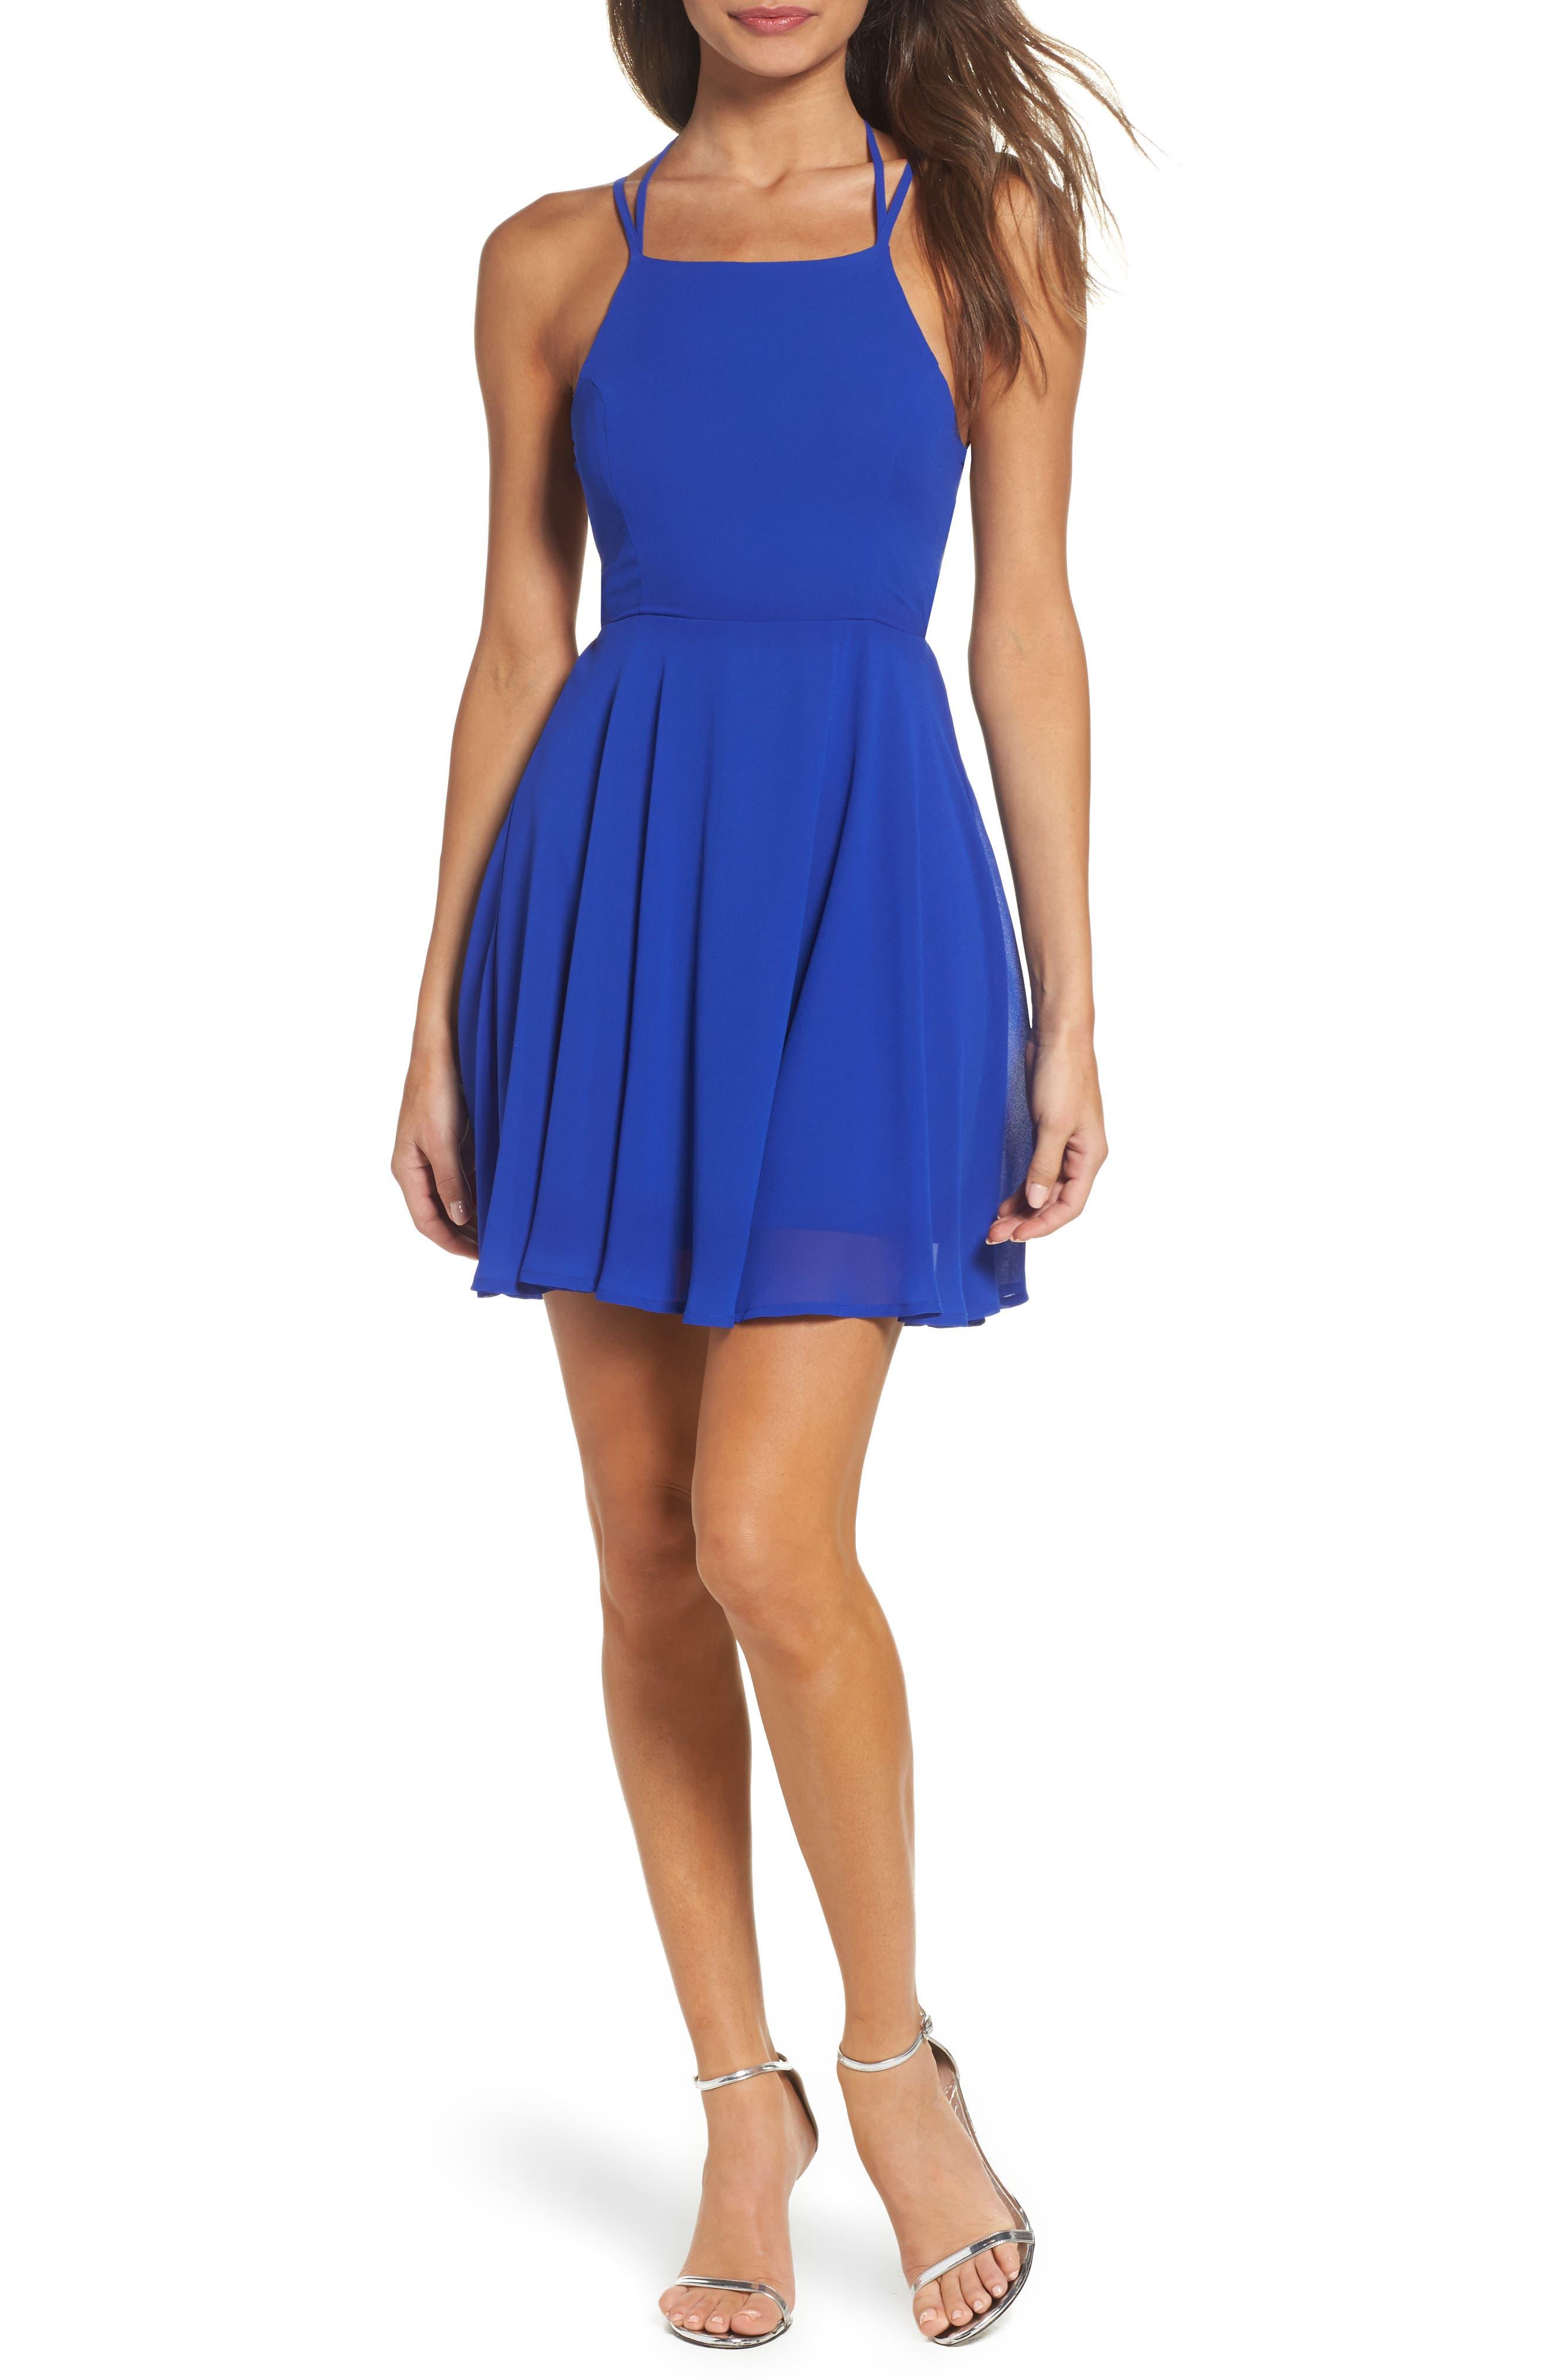 Lulus Good Deeds Lace-Up Skater Dress, Blue